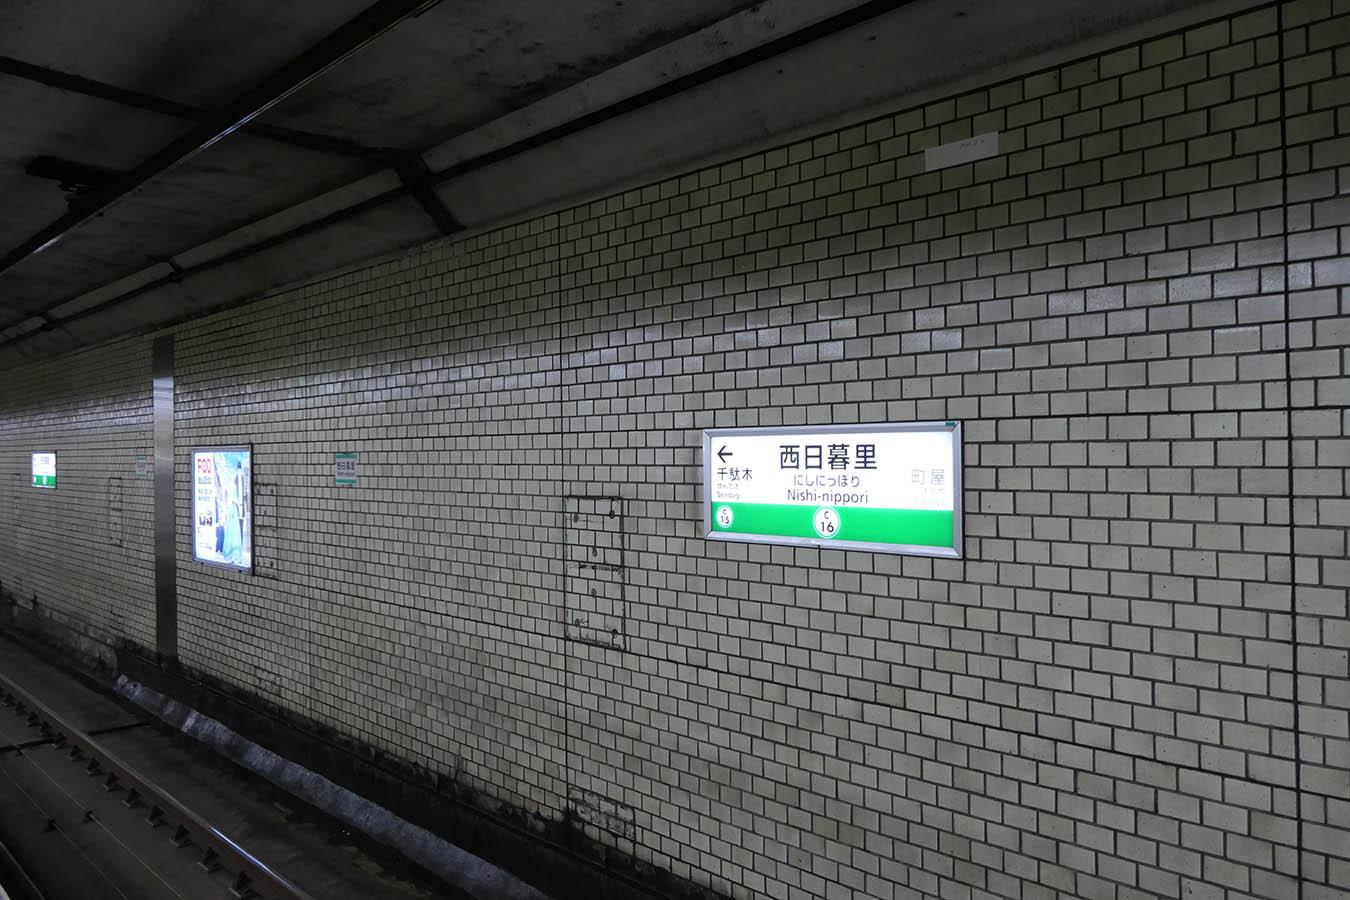 C16_photo01.jpg